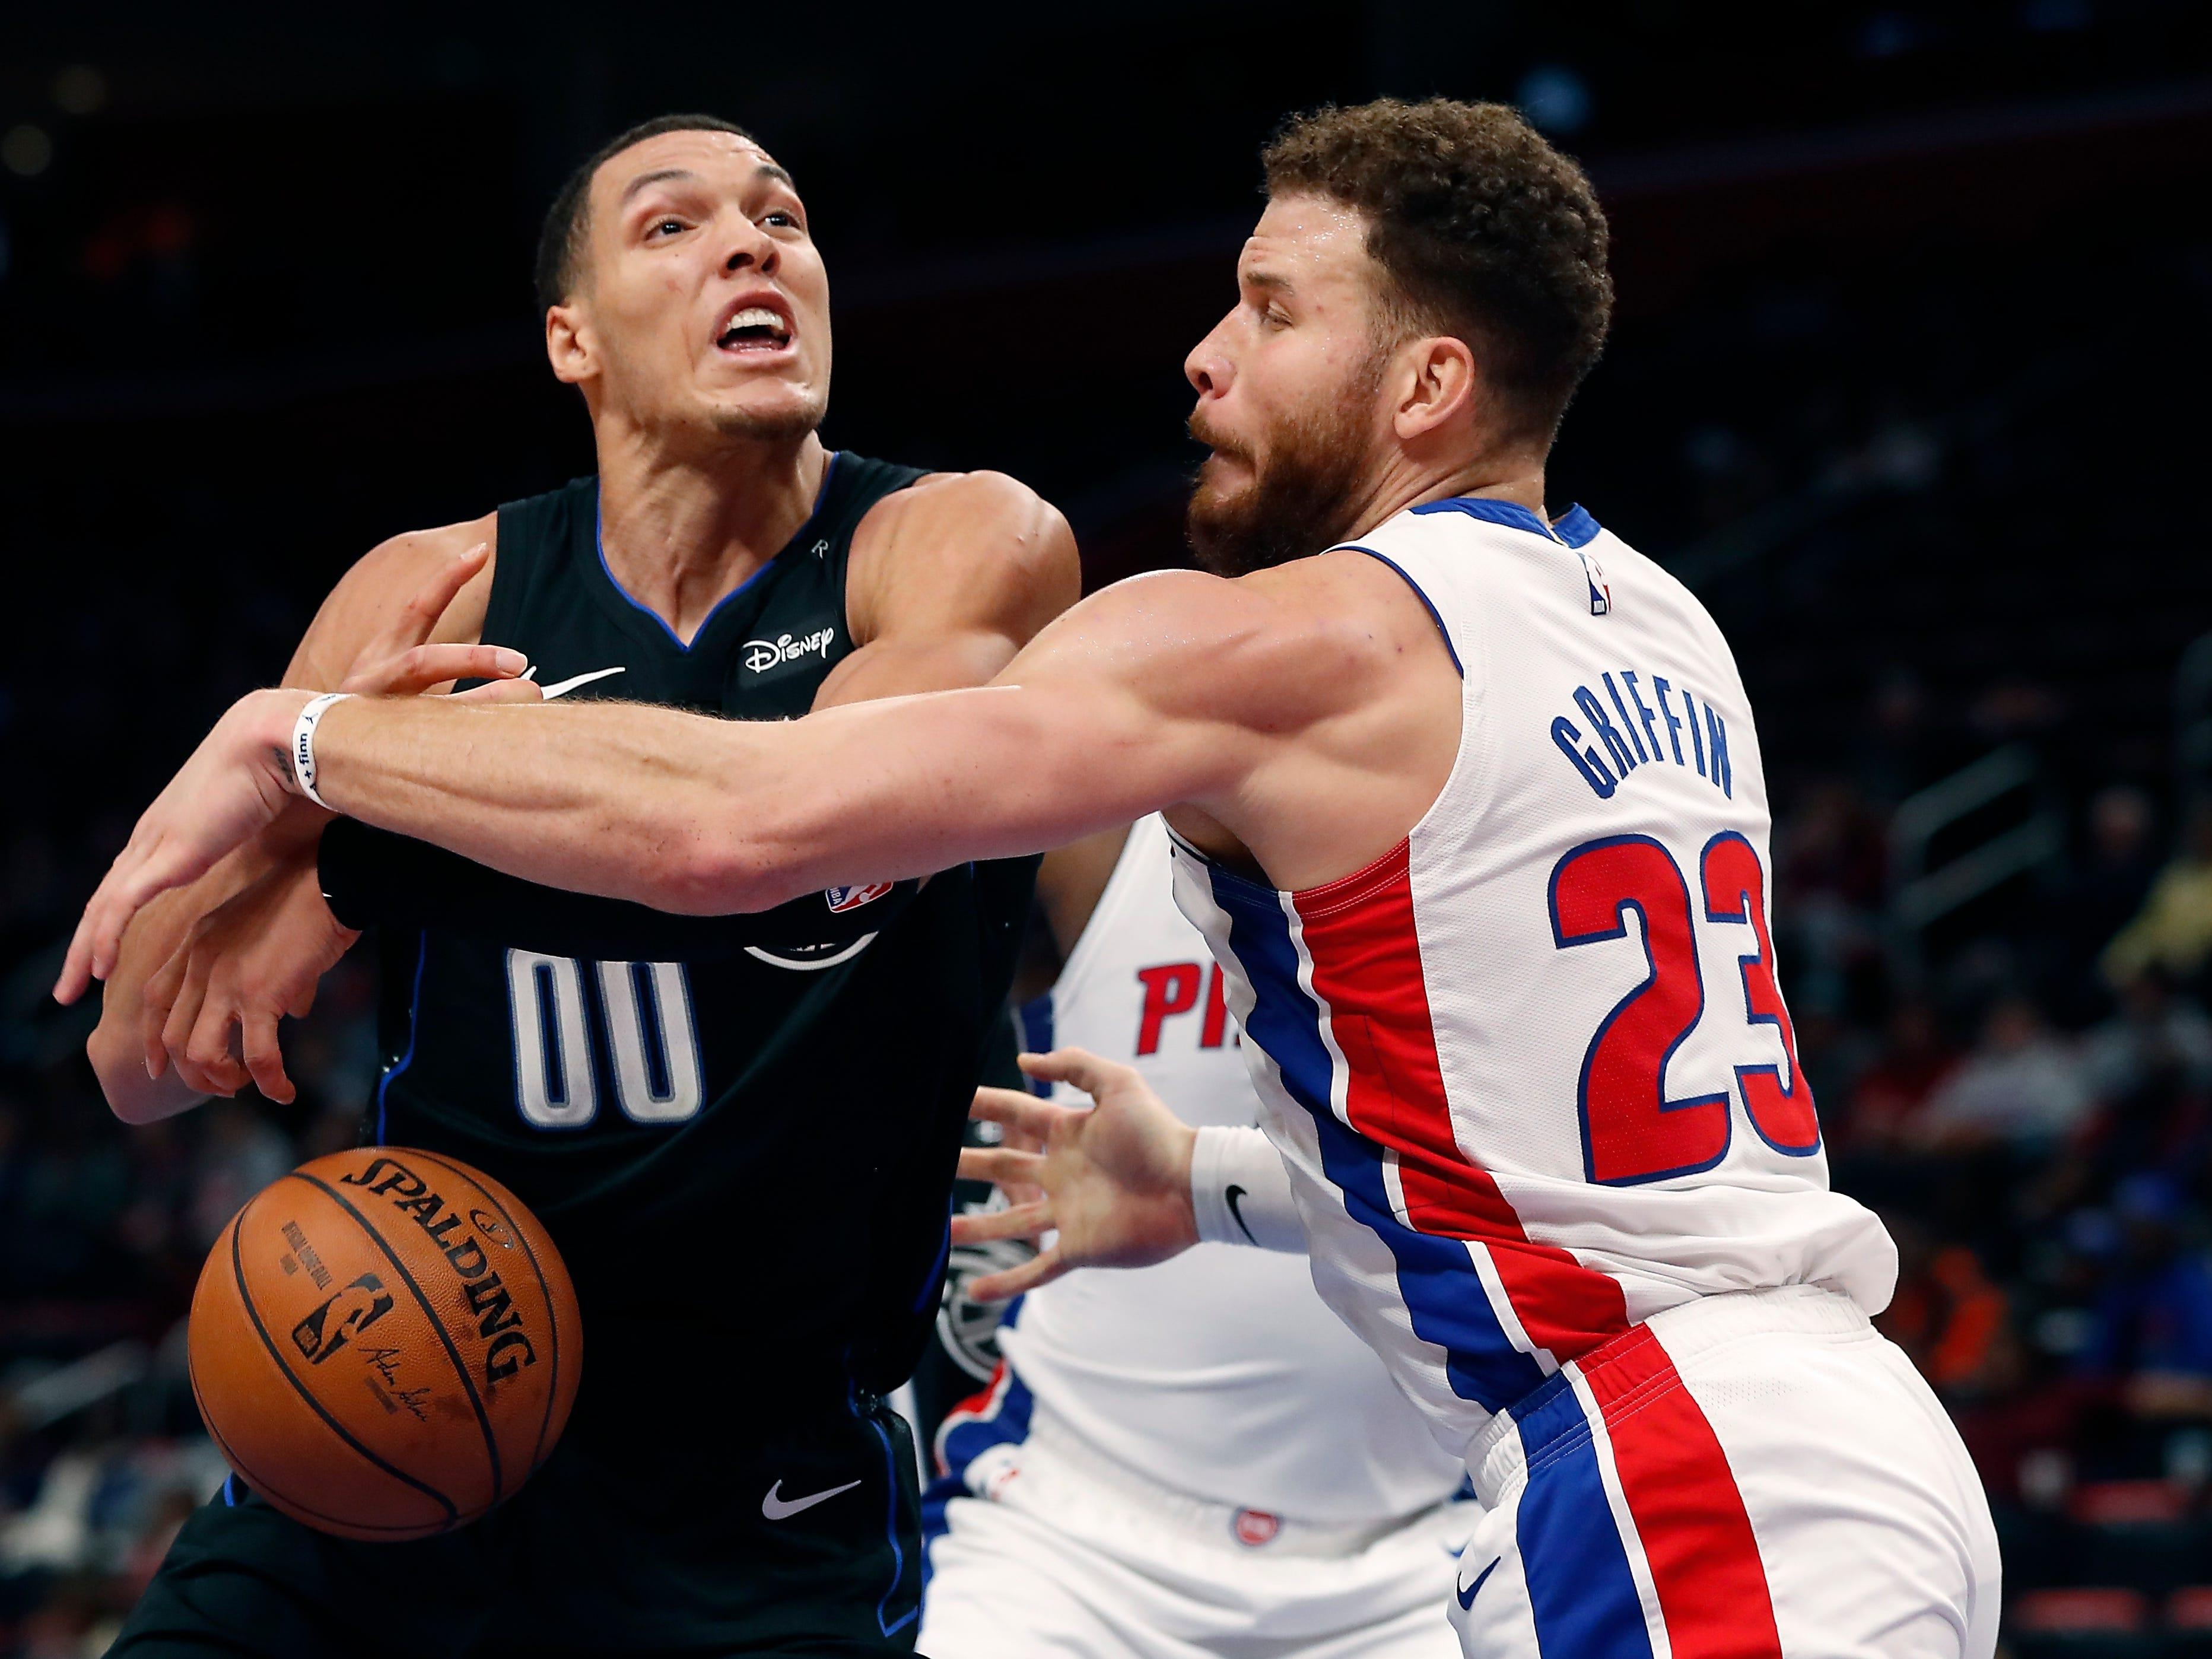 Detroit Pistons forward Blake Griffin (23) knocks the ball away from Orlando Magic forward Aaron Gordon (00) during the second half.